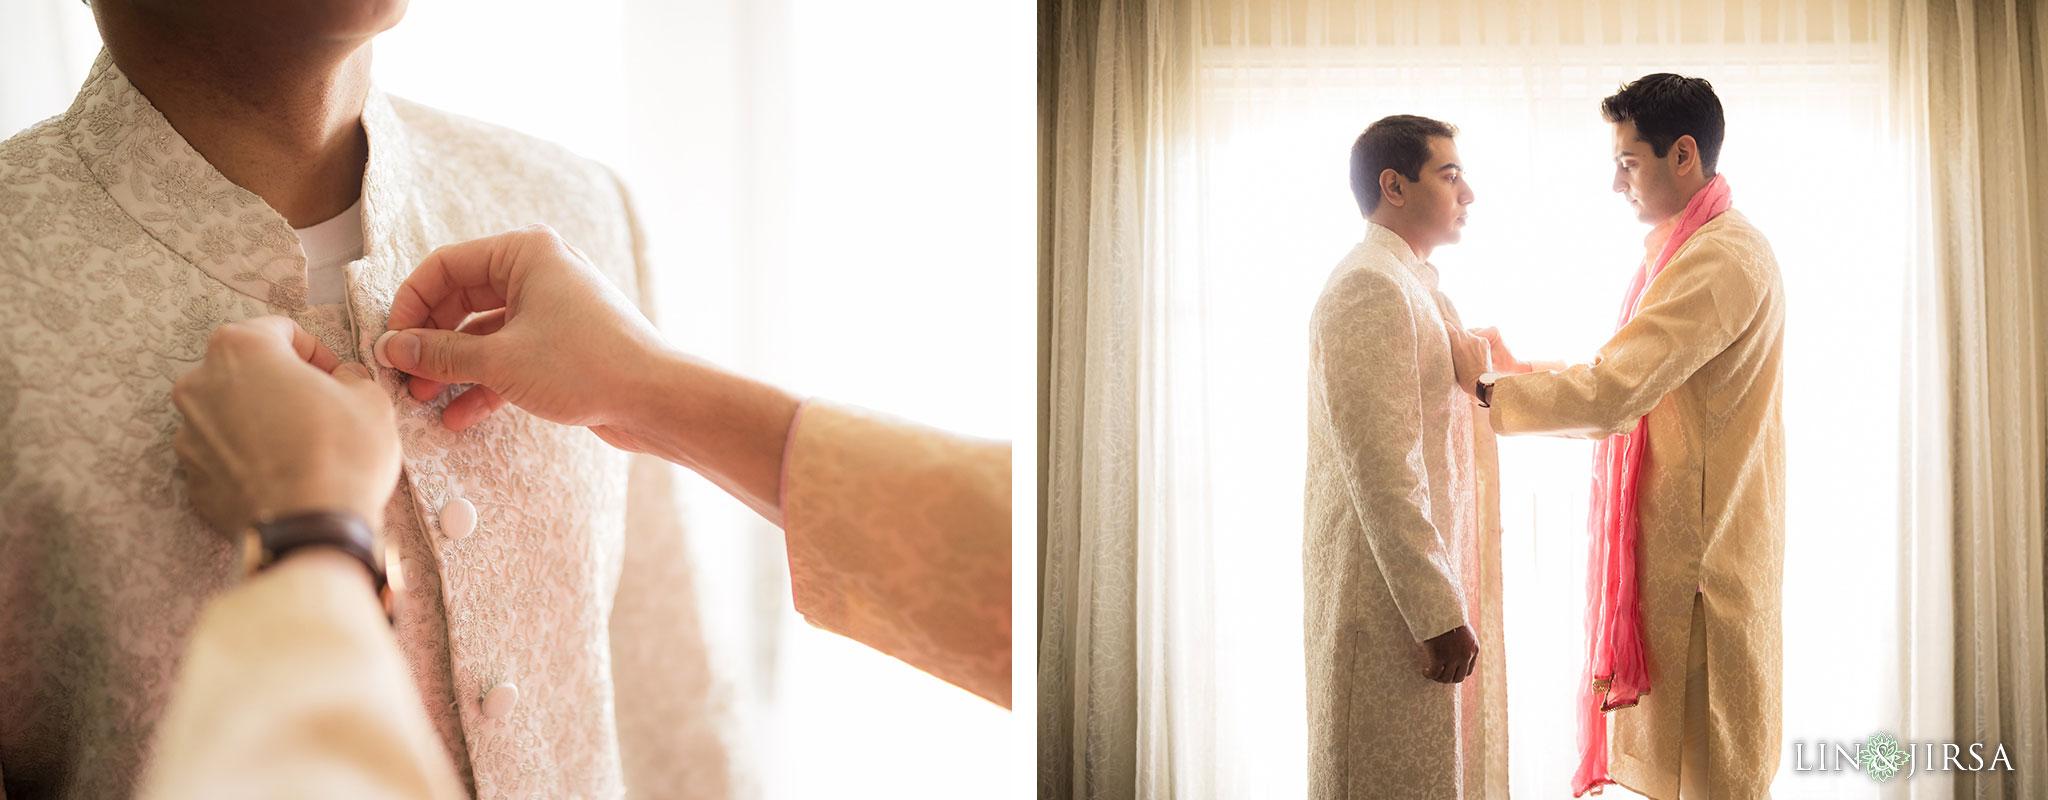 10 ritz carlton laguna niguel indian groom wedding photography